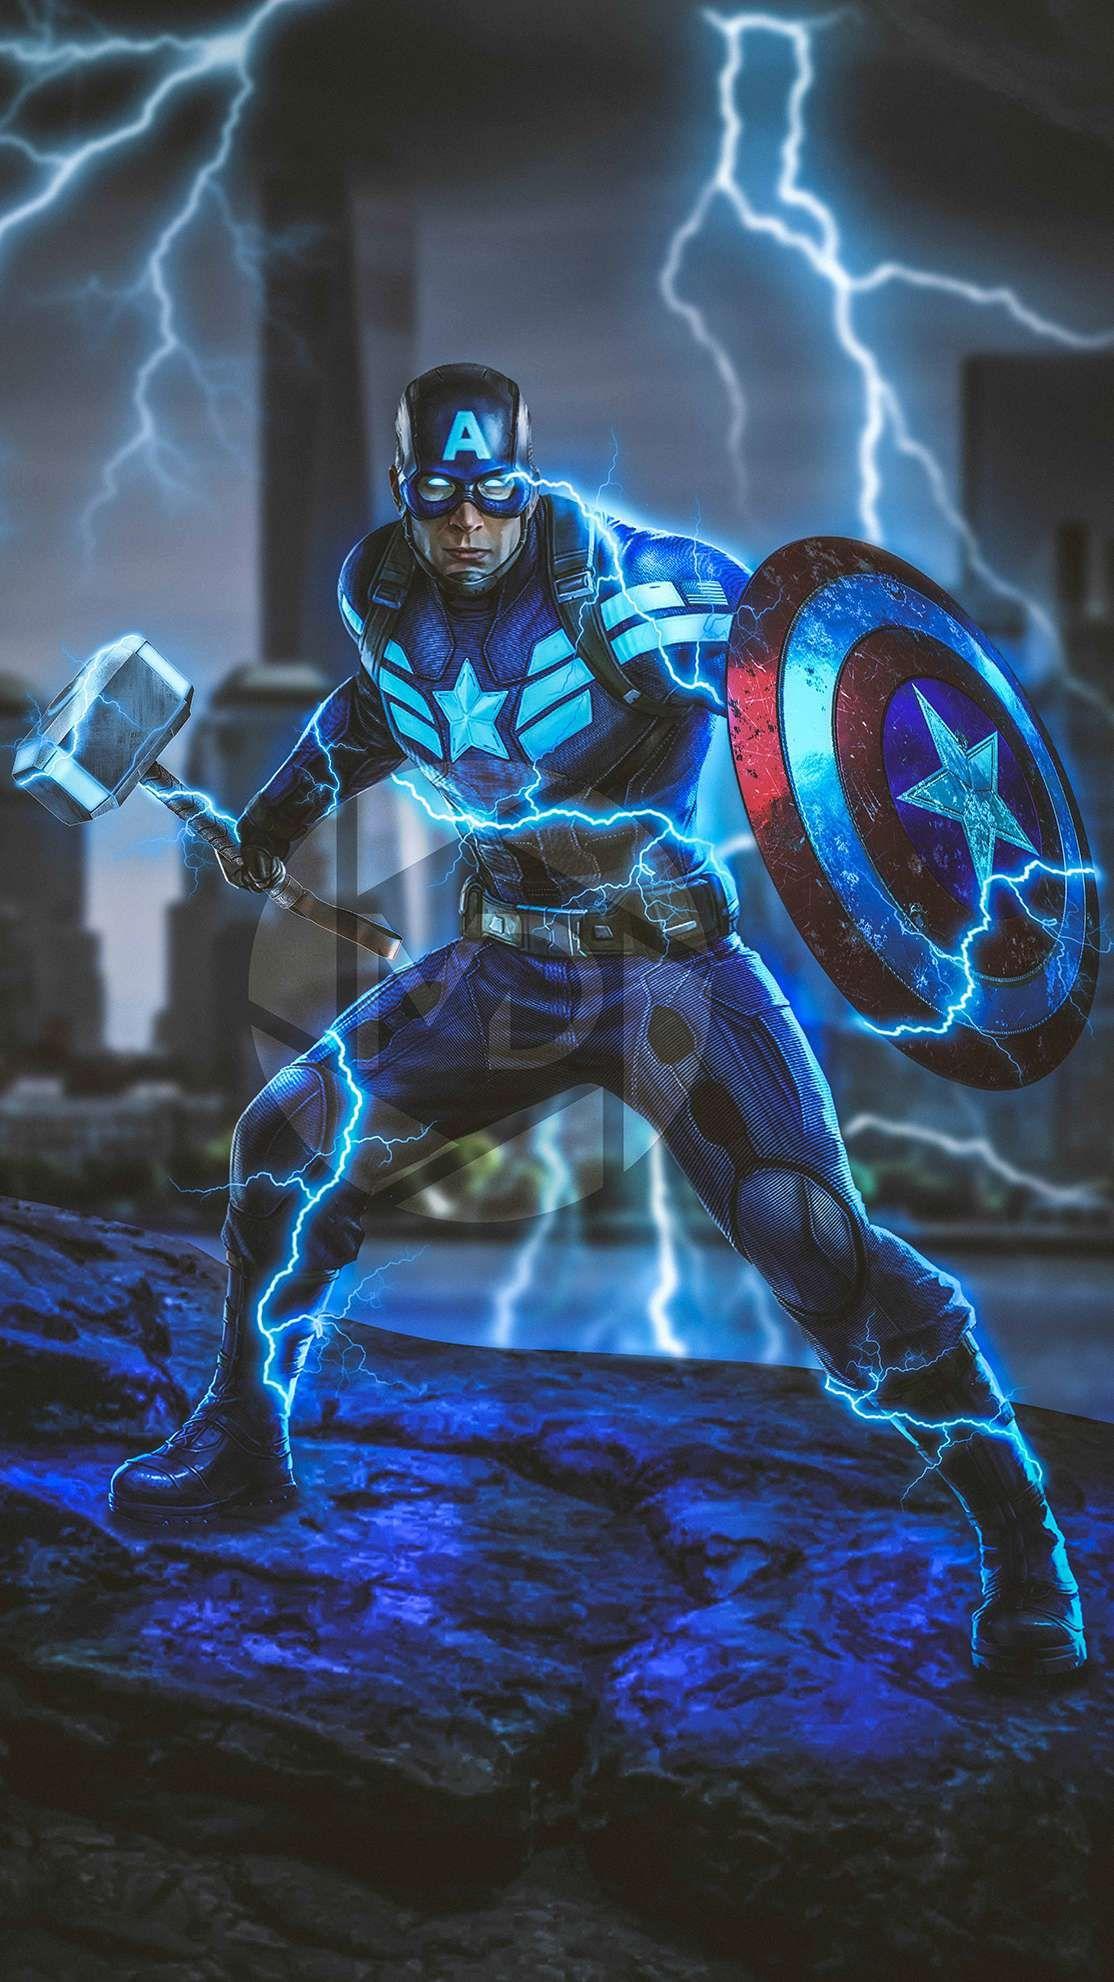 Captain America With Thor Hammer Avengers Endgame Iphone Wallpaper Iphone Wallpapers In 2020 Captain America Wallpaper Marvel Comics Wallpaper Superhero Wallpaper